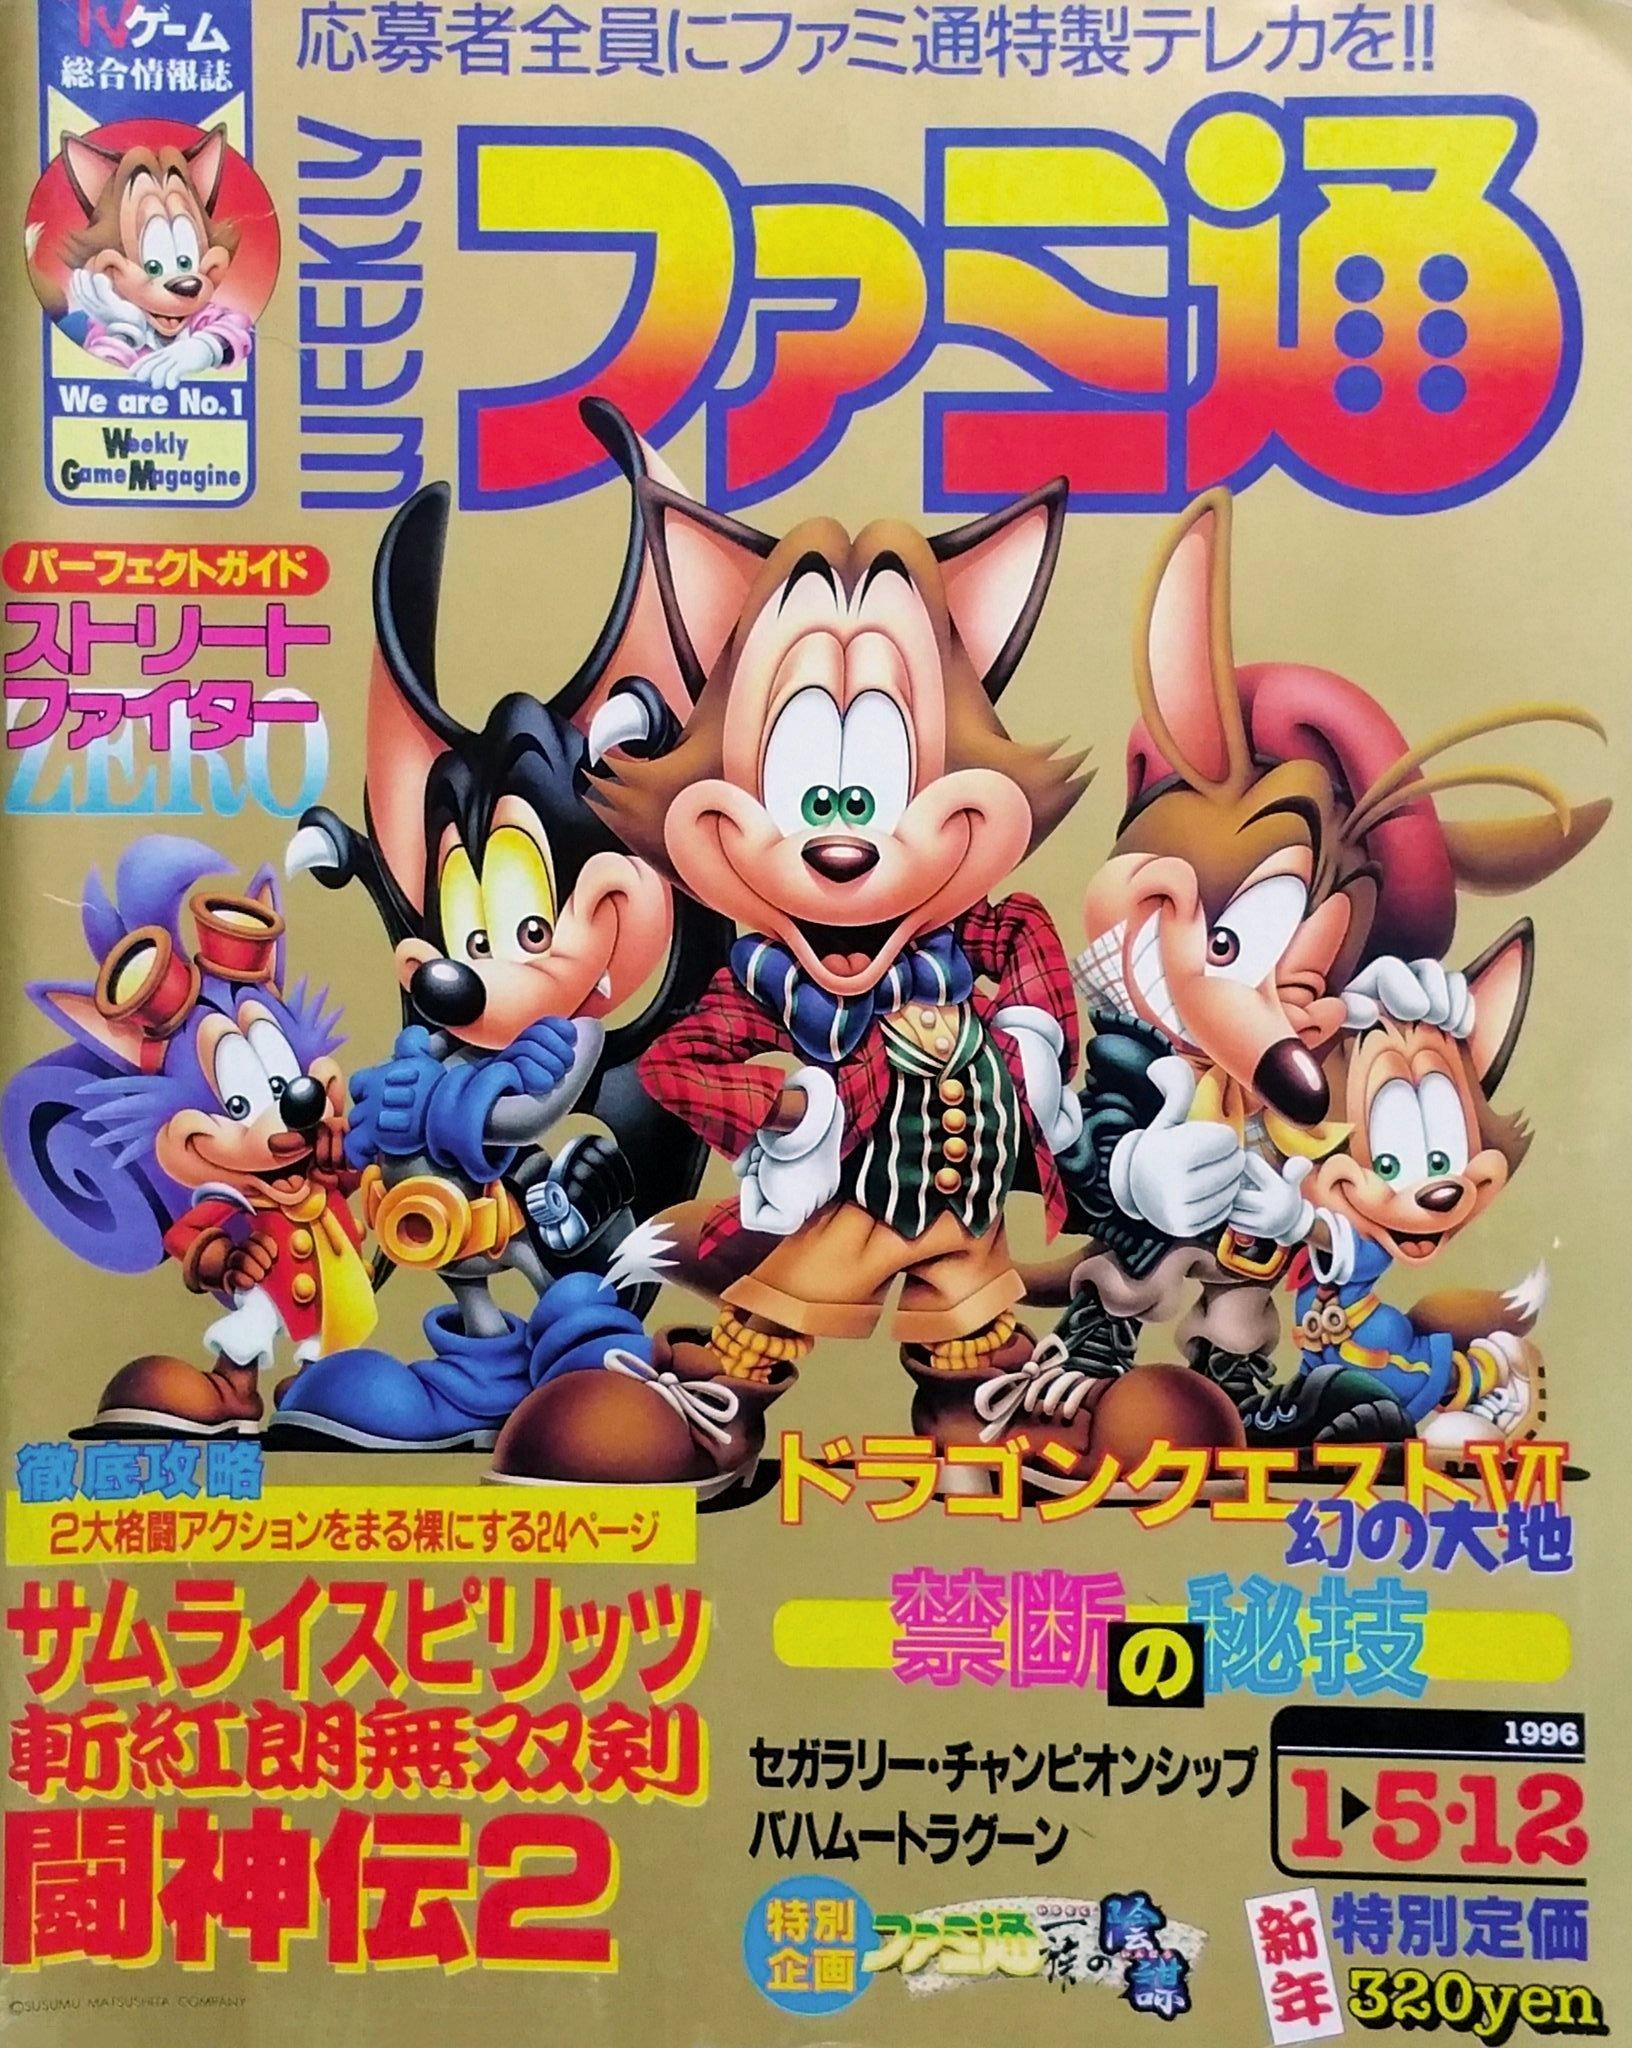 Famitsu 0368/0369 (January 5/12, 1996)